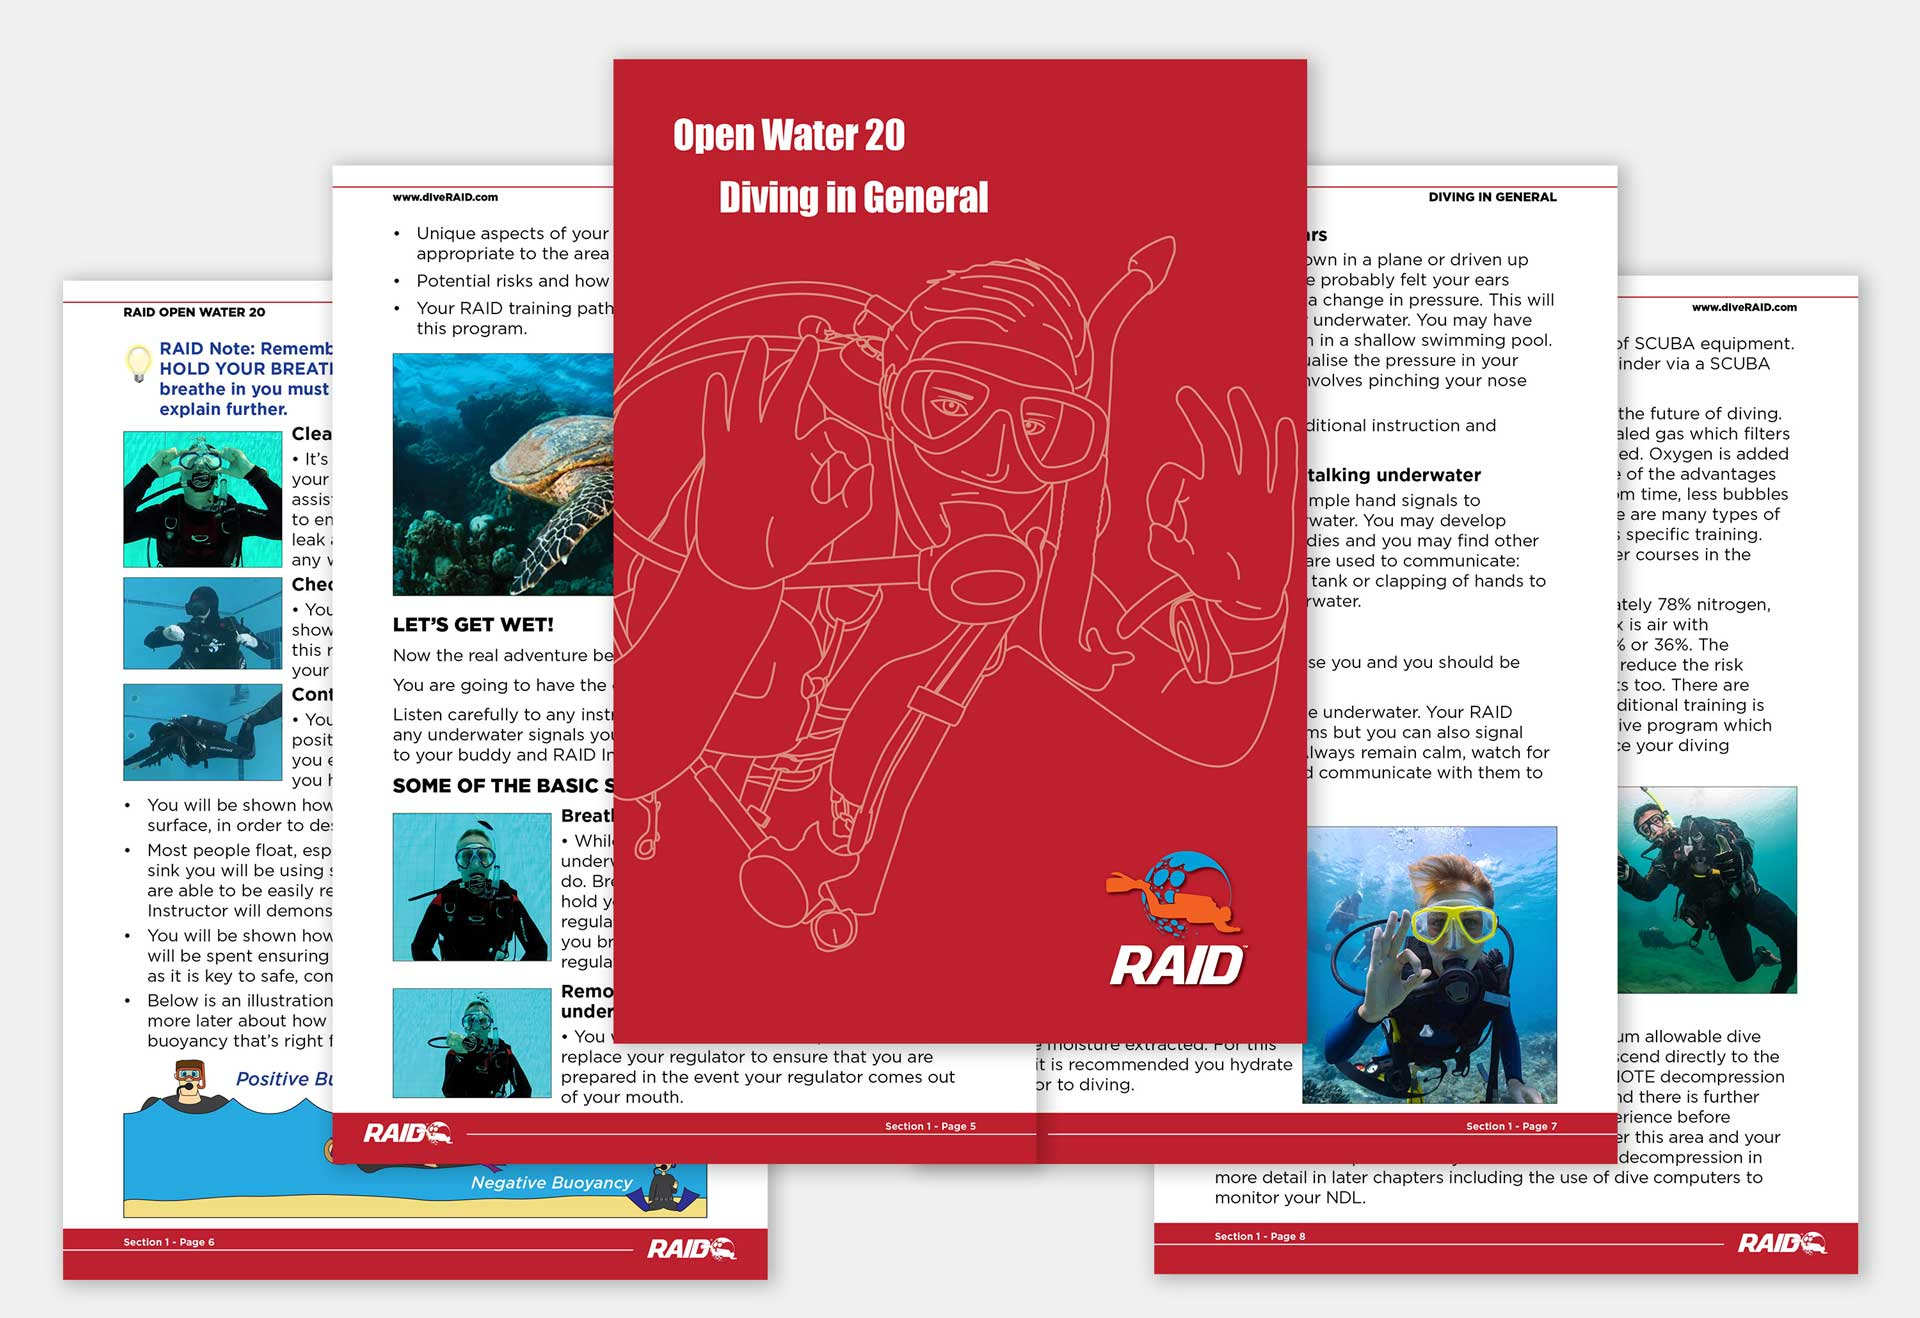 scubadiver-ed com | Official Scuba Certification Course